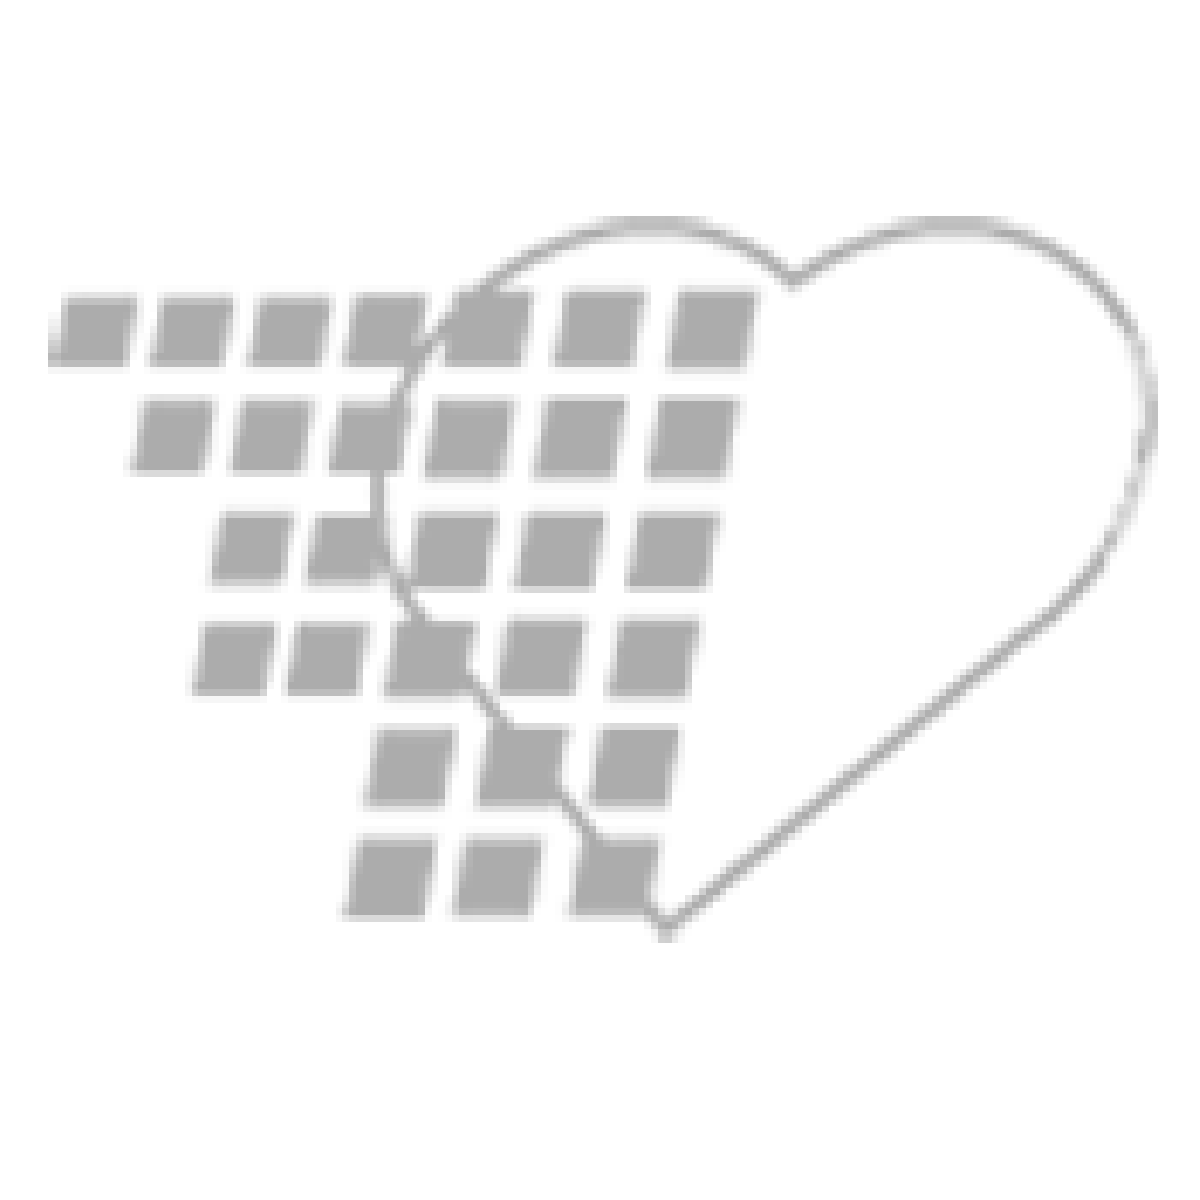 09-31-9783 Chronic Obstructive Pulmonary Disease Chart